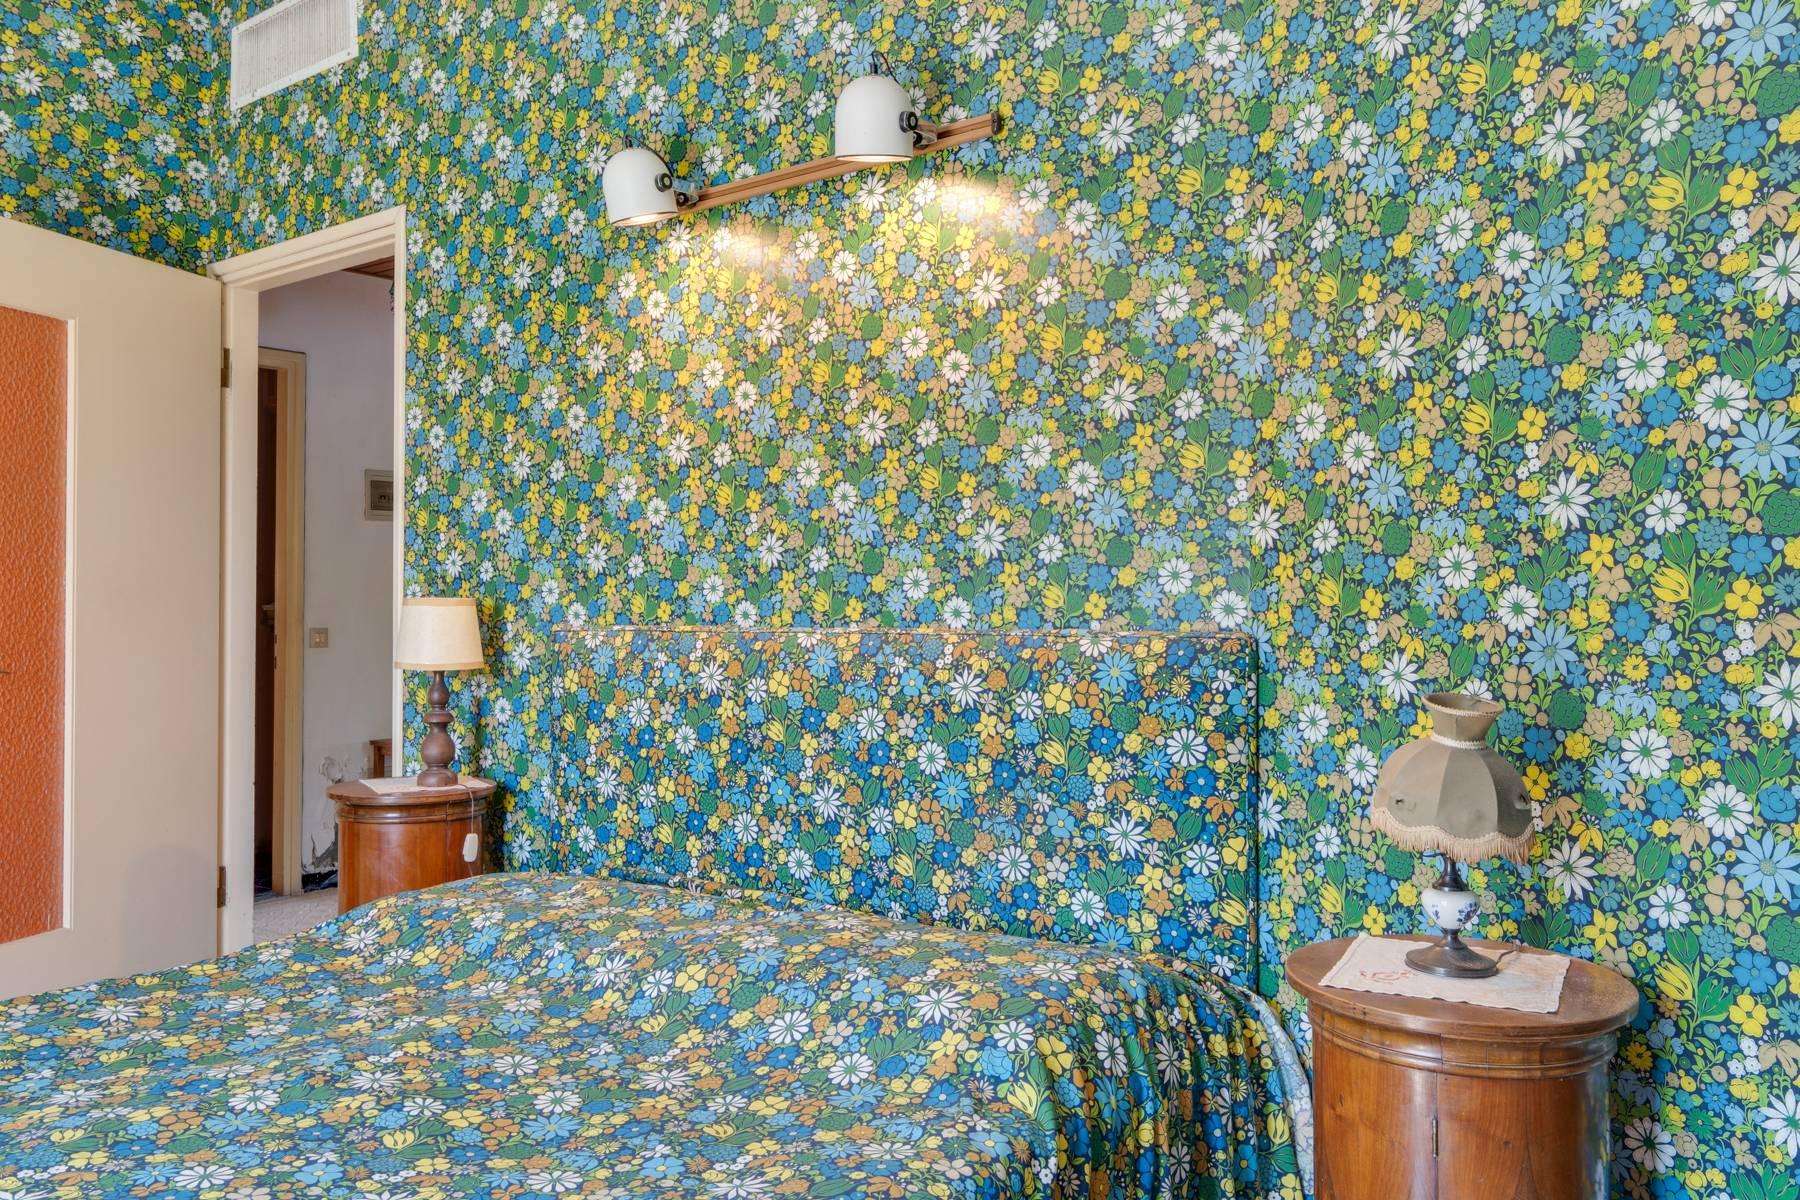 Villa in Vendita a Stresa: 5 locali, 150 mq - Foto 21